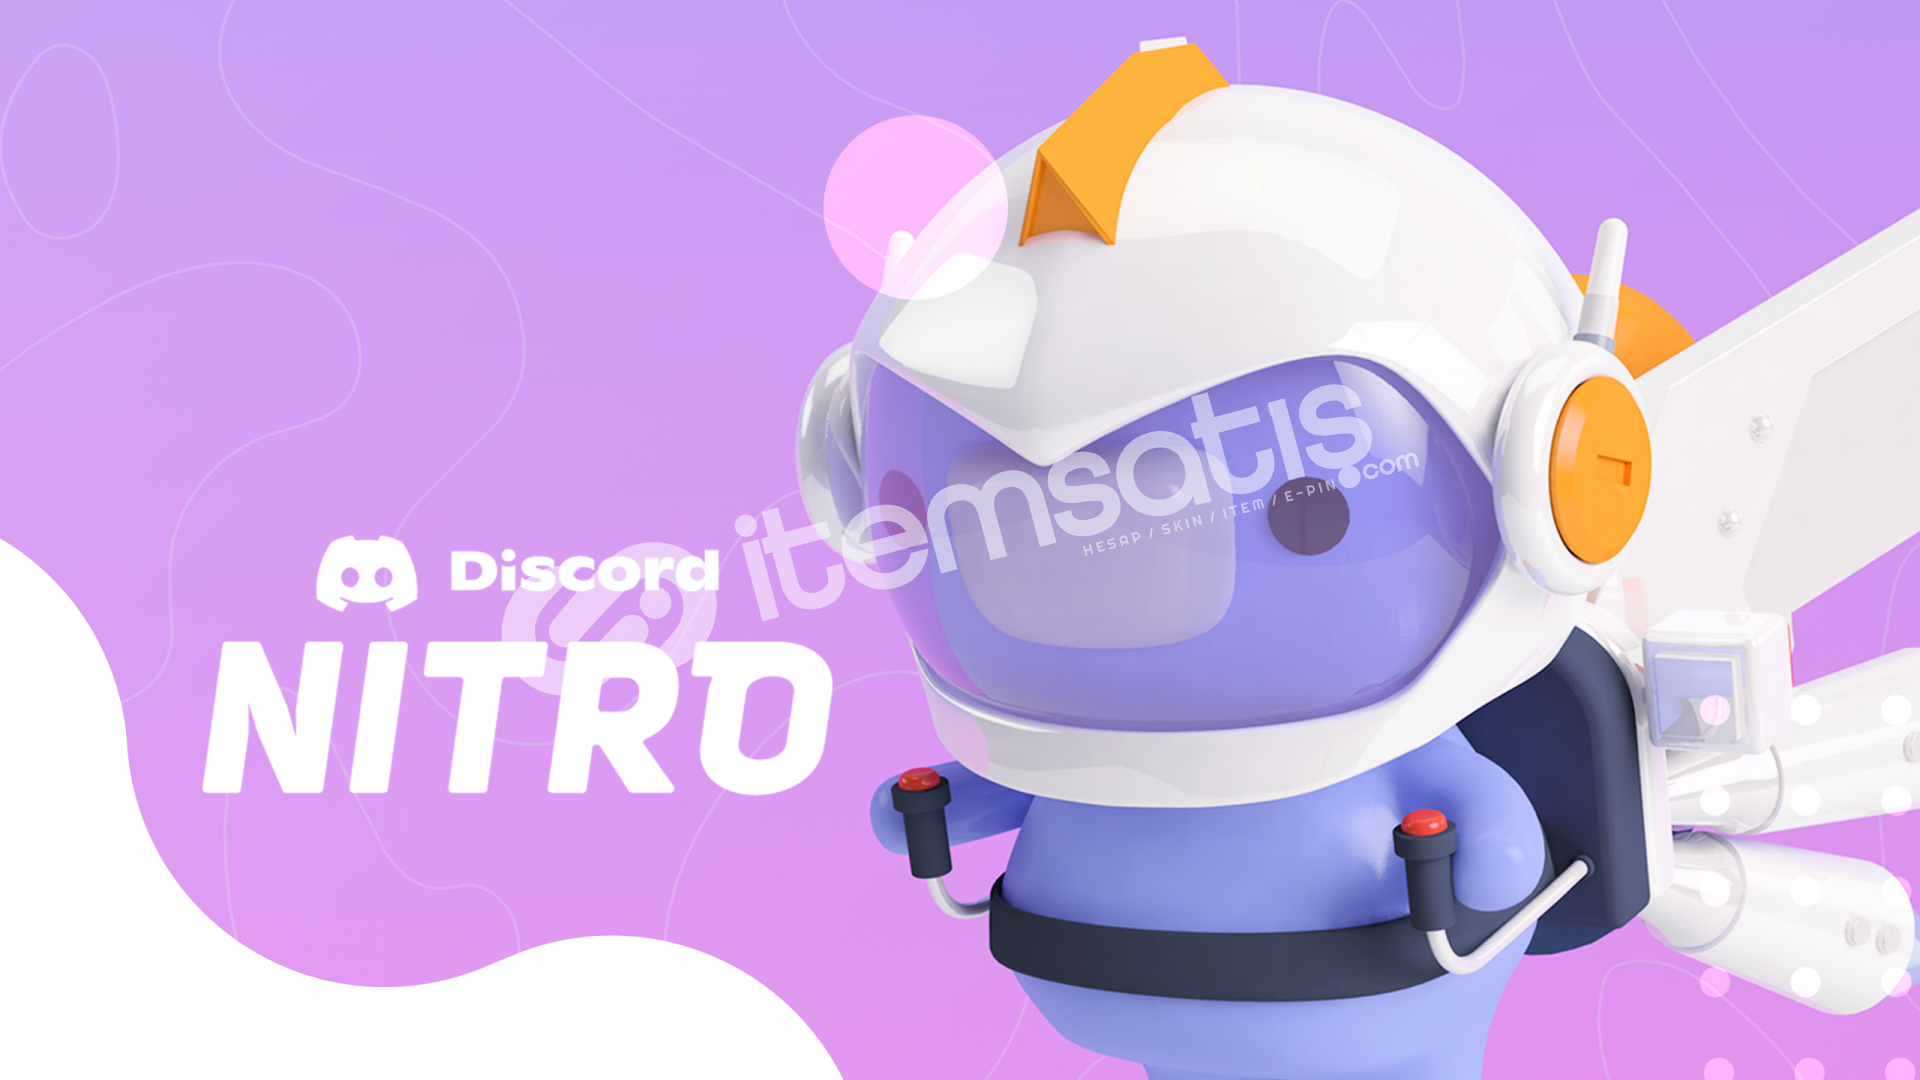 (FIRSAT)- 3 Aylık, x2 Boostlu Discord Nitro